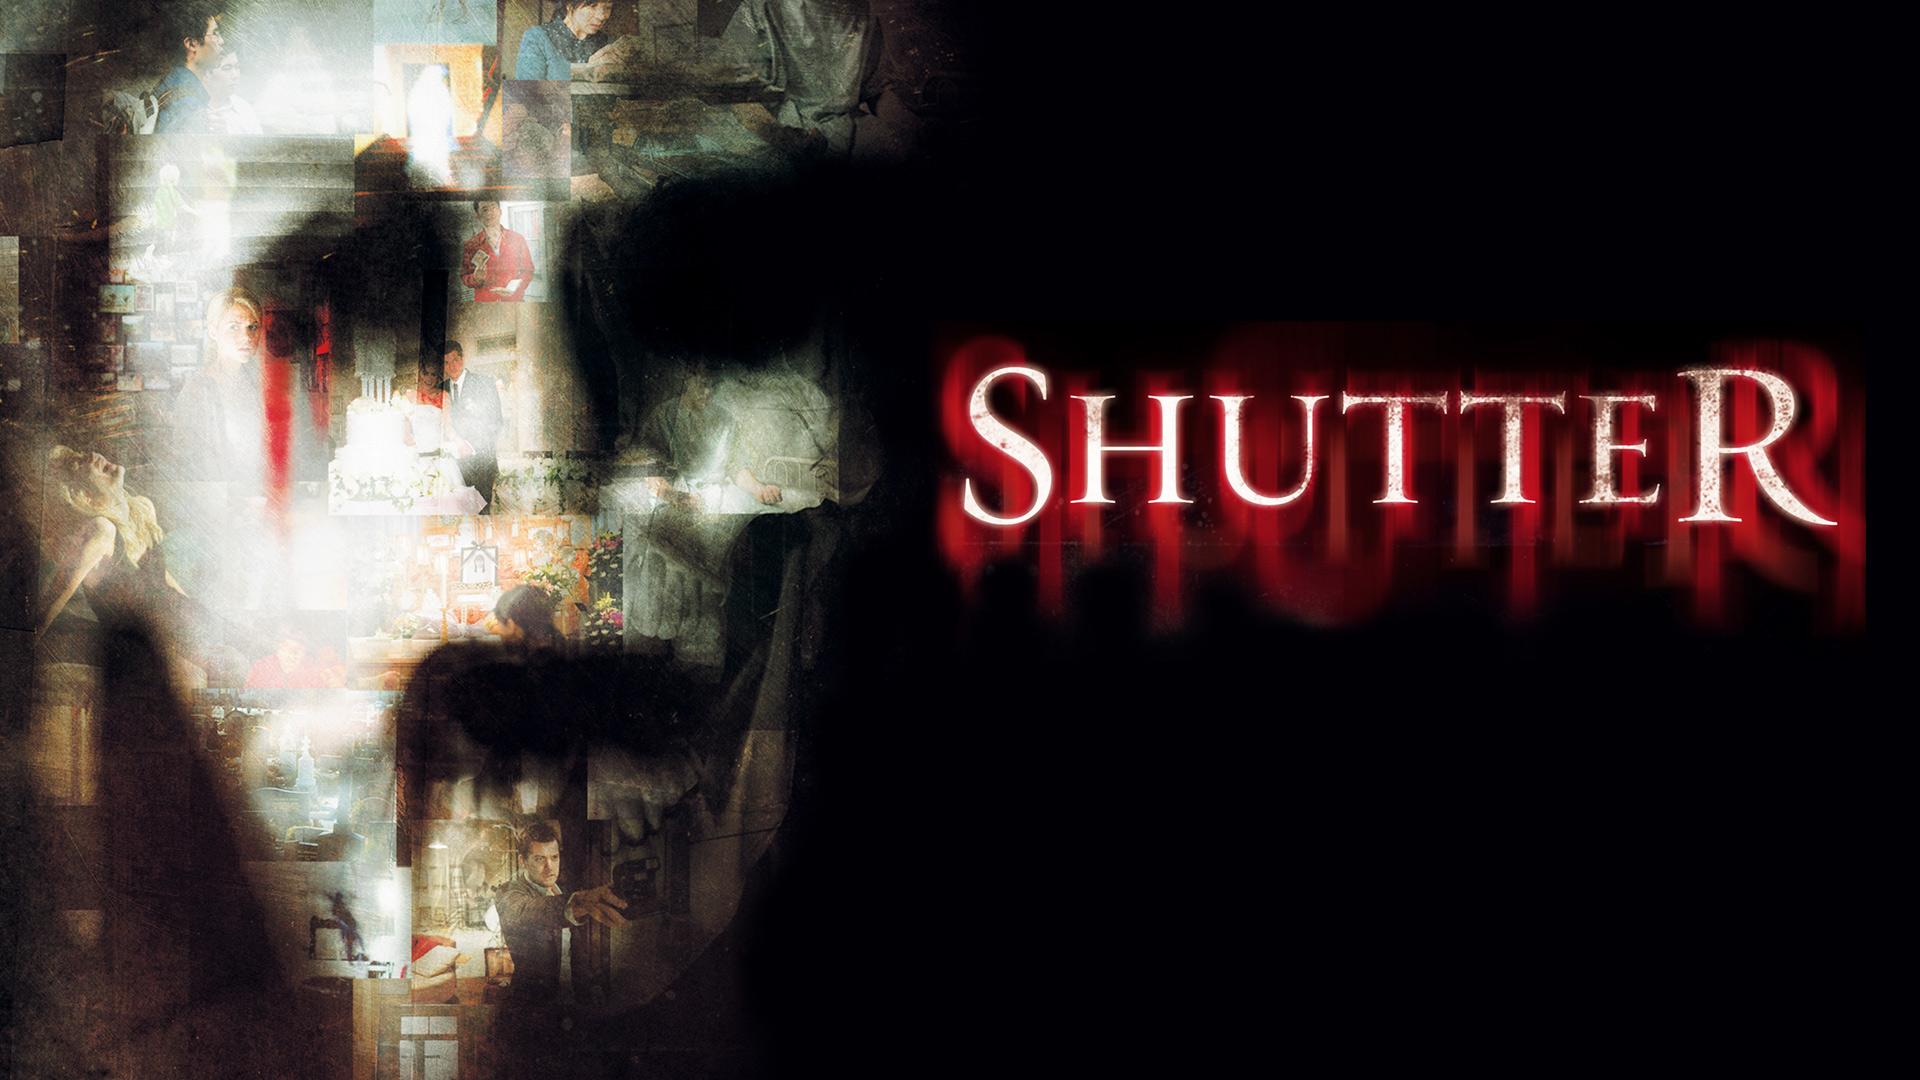 Shutter (字幕版)